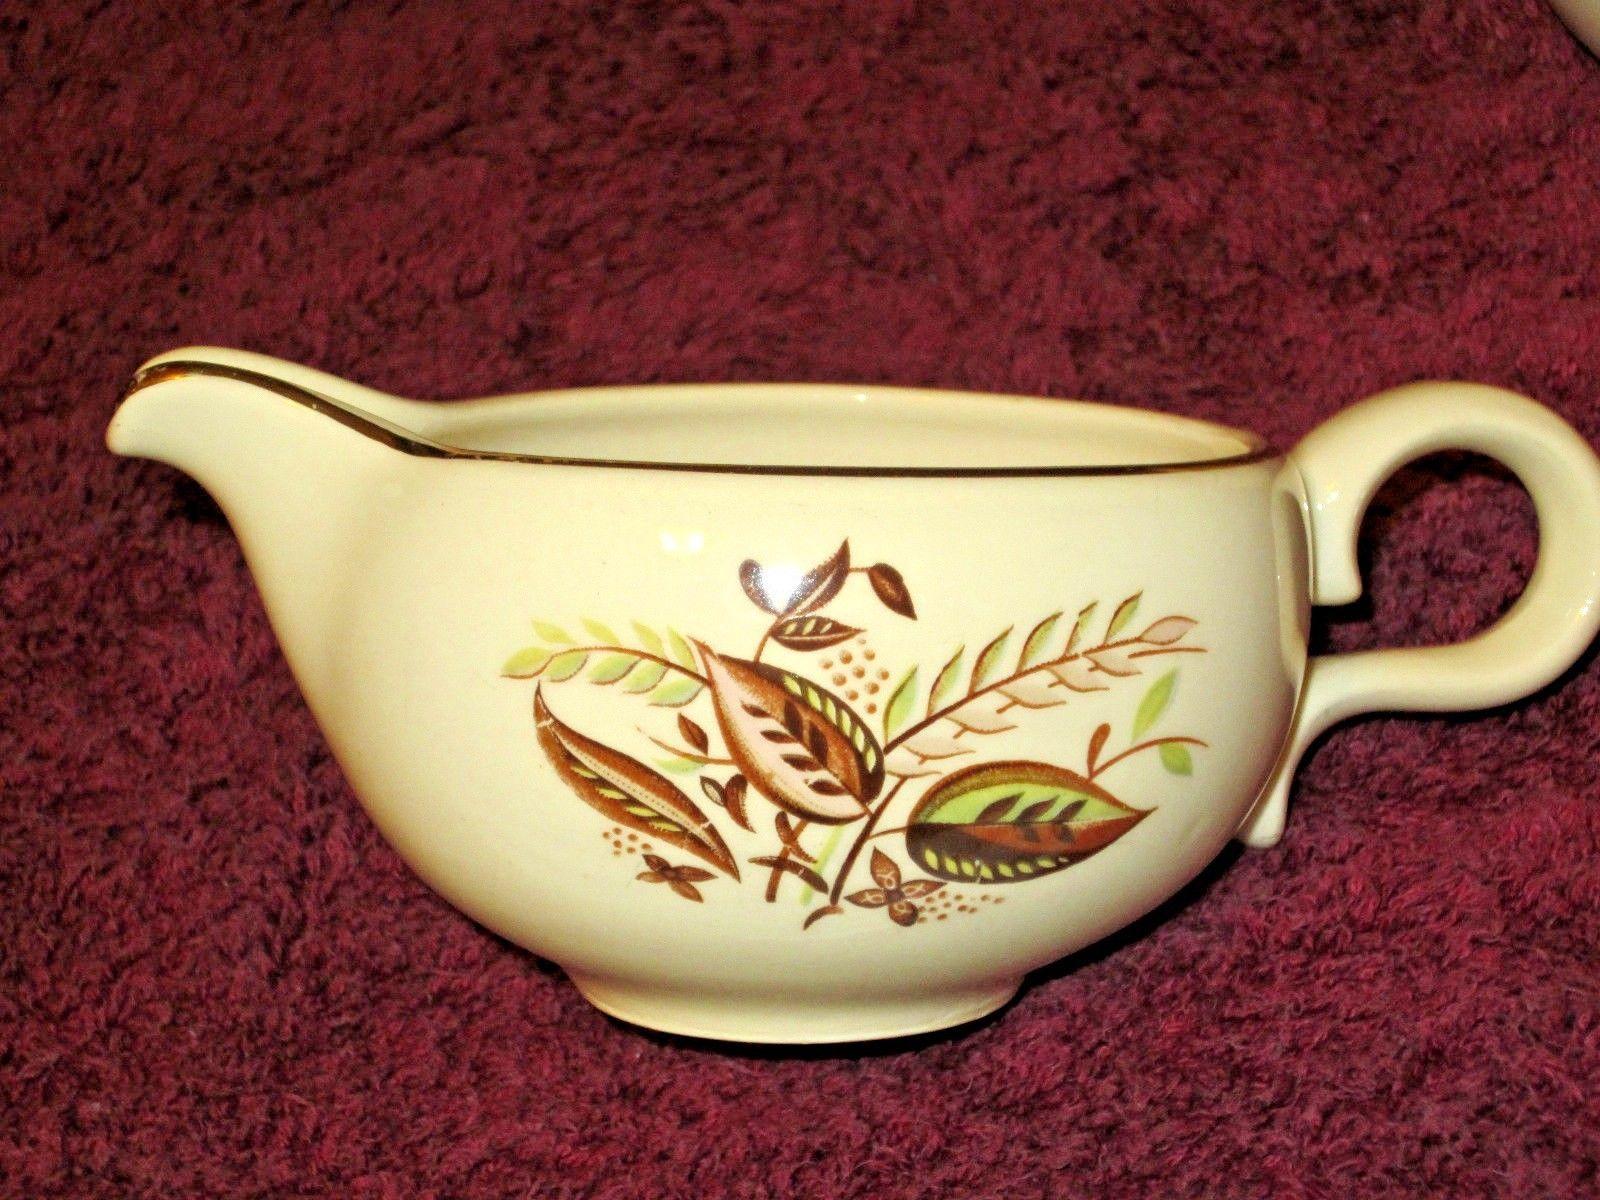 Creamer & Sugar Gravy Bowl Set 4 pc Autum Fall Leaf Pattern Vintage